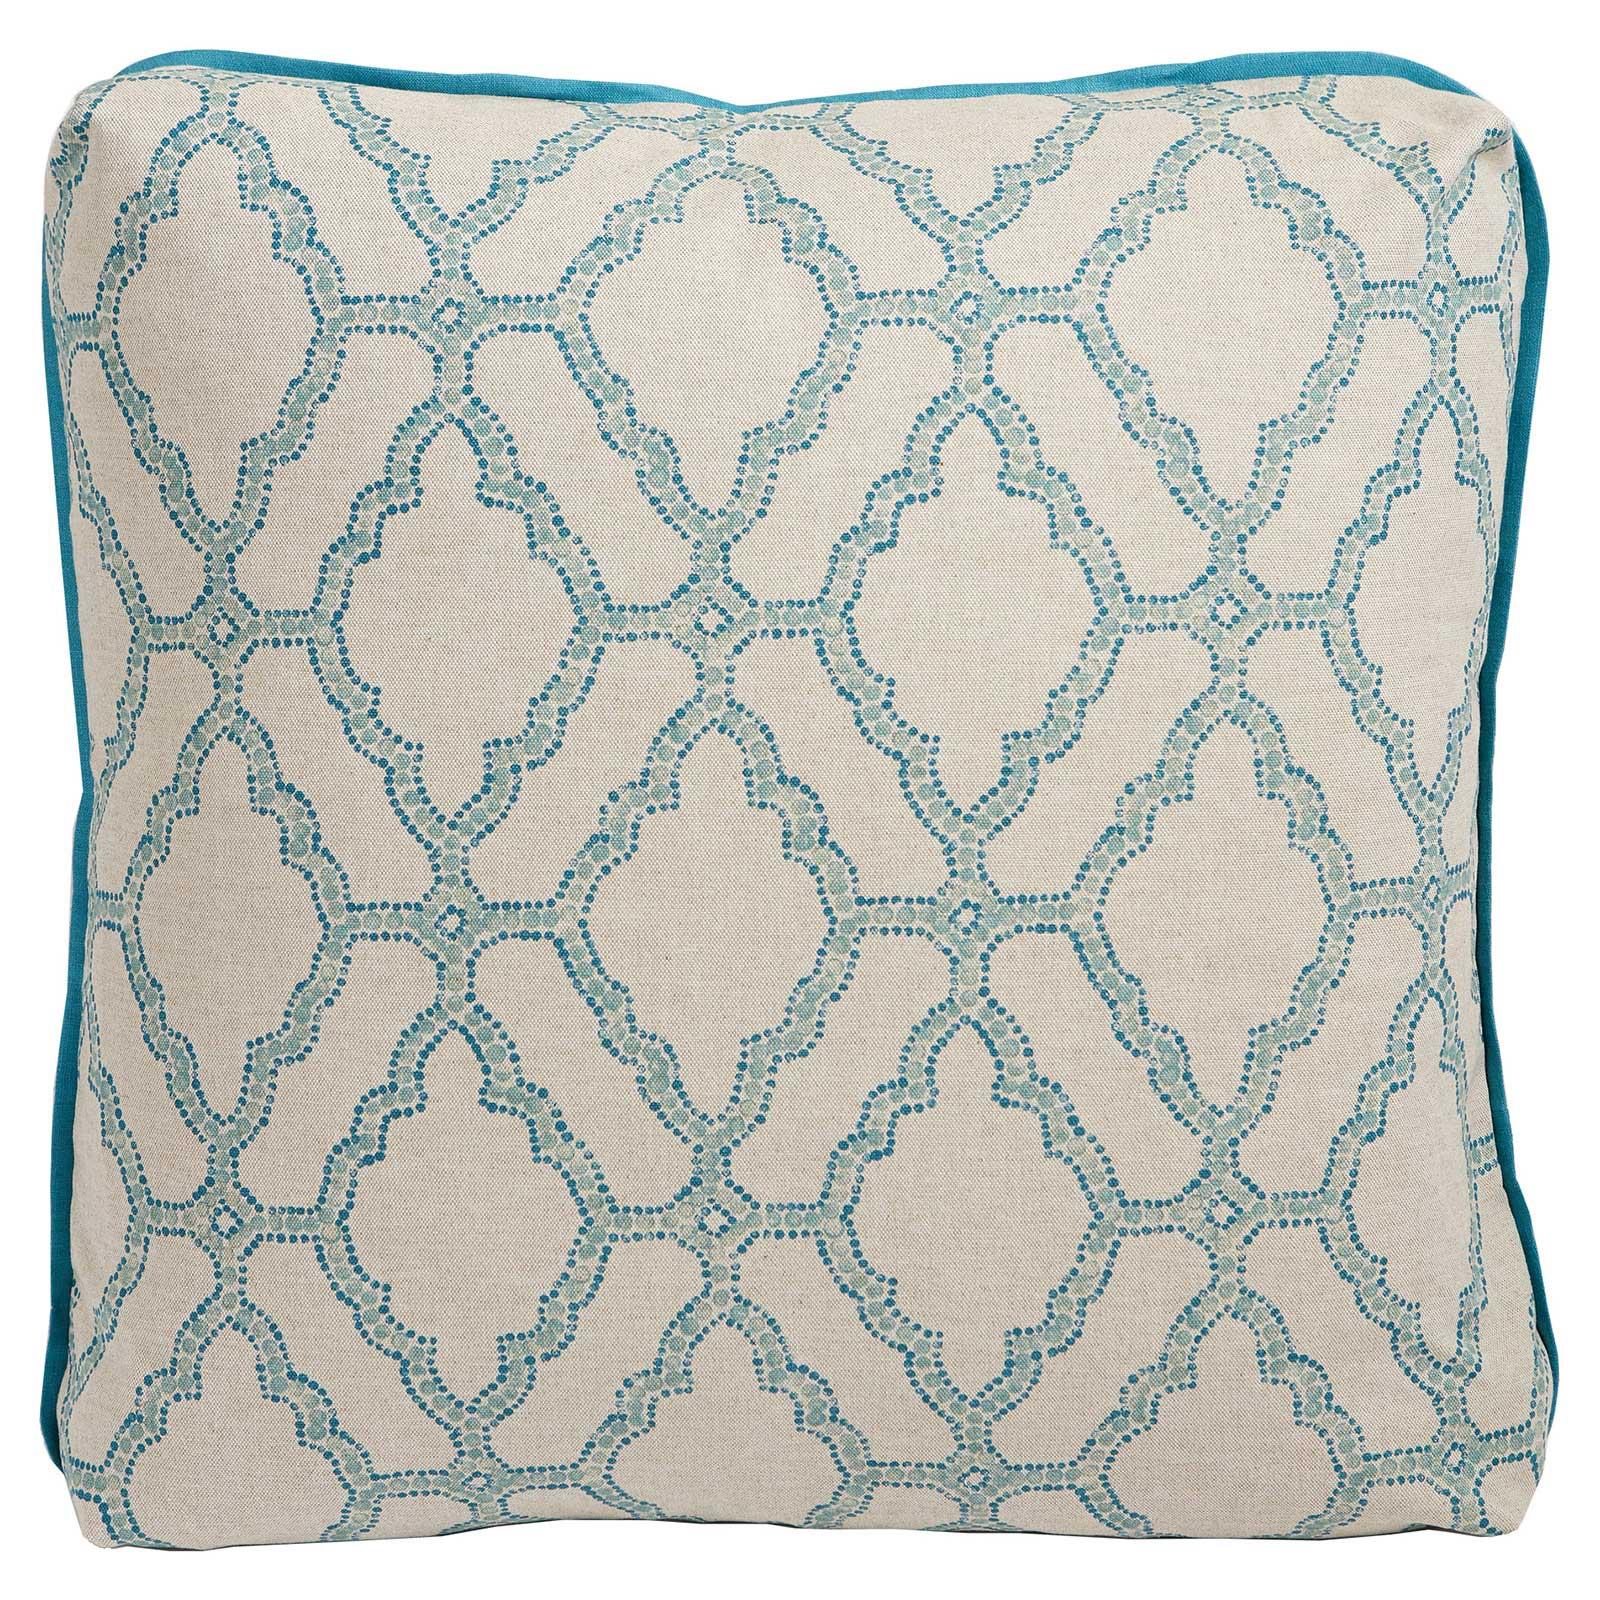 Esma Global Bazaar Turkish Medallion Teal Linen Pillow- 24x24